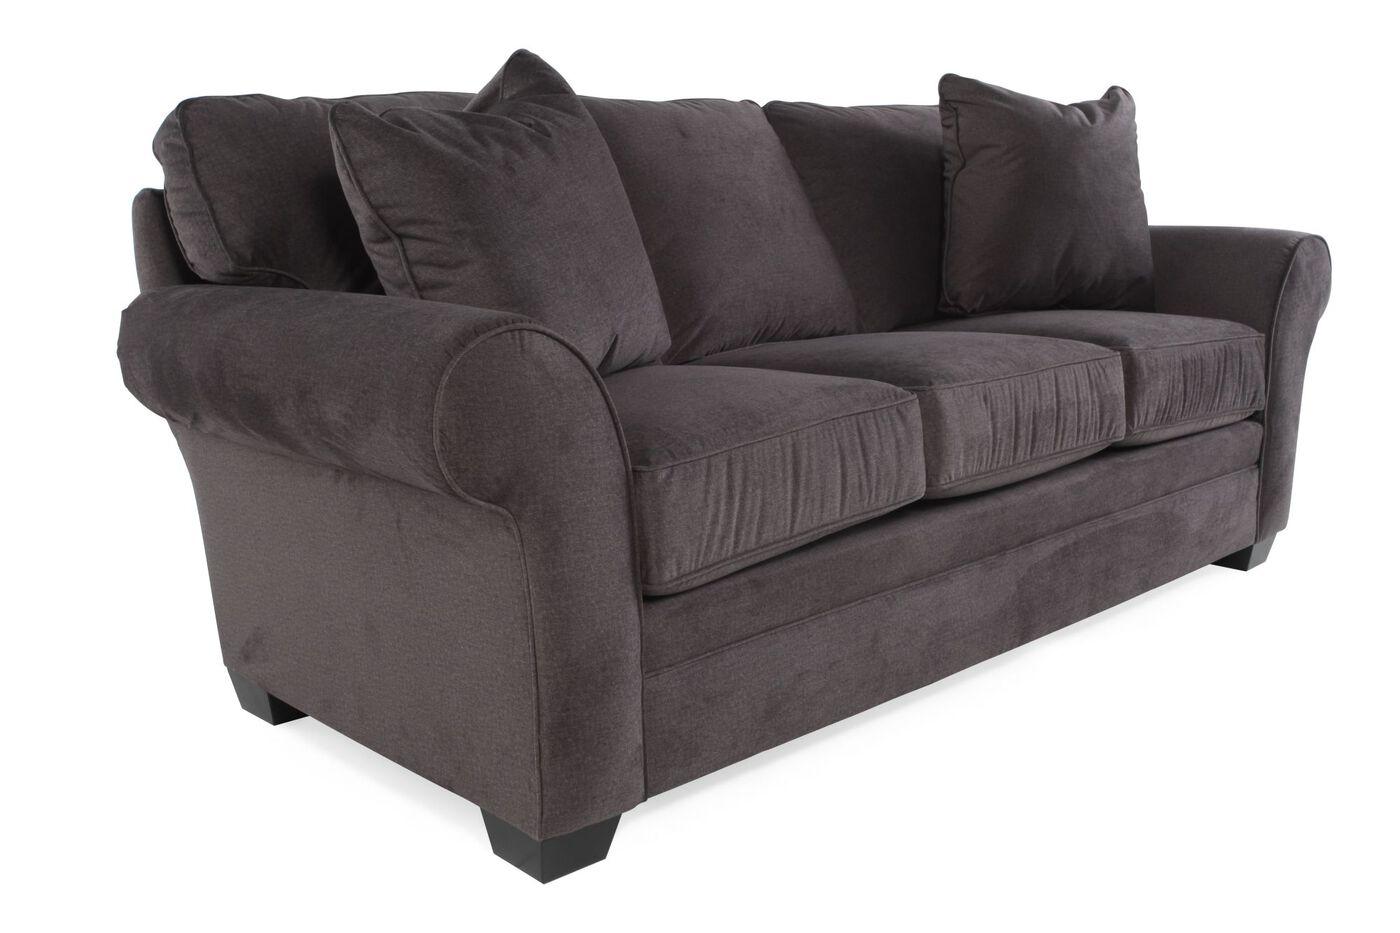 Broyhill Zachary Sofa Mathis Brothers Furniture - Broyhill zachary sofa